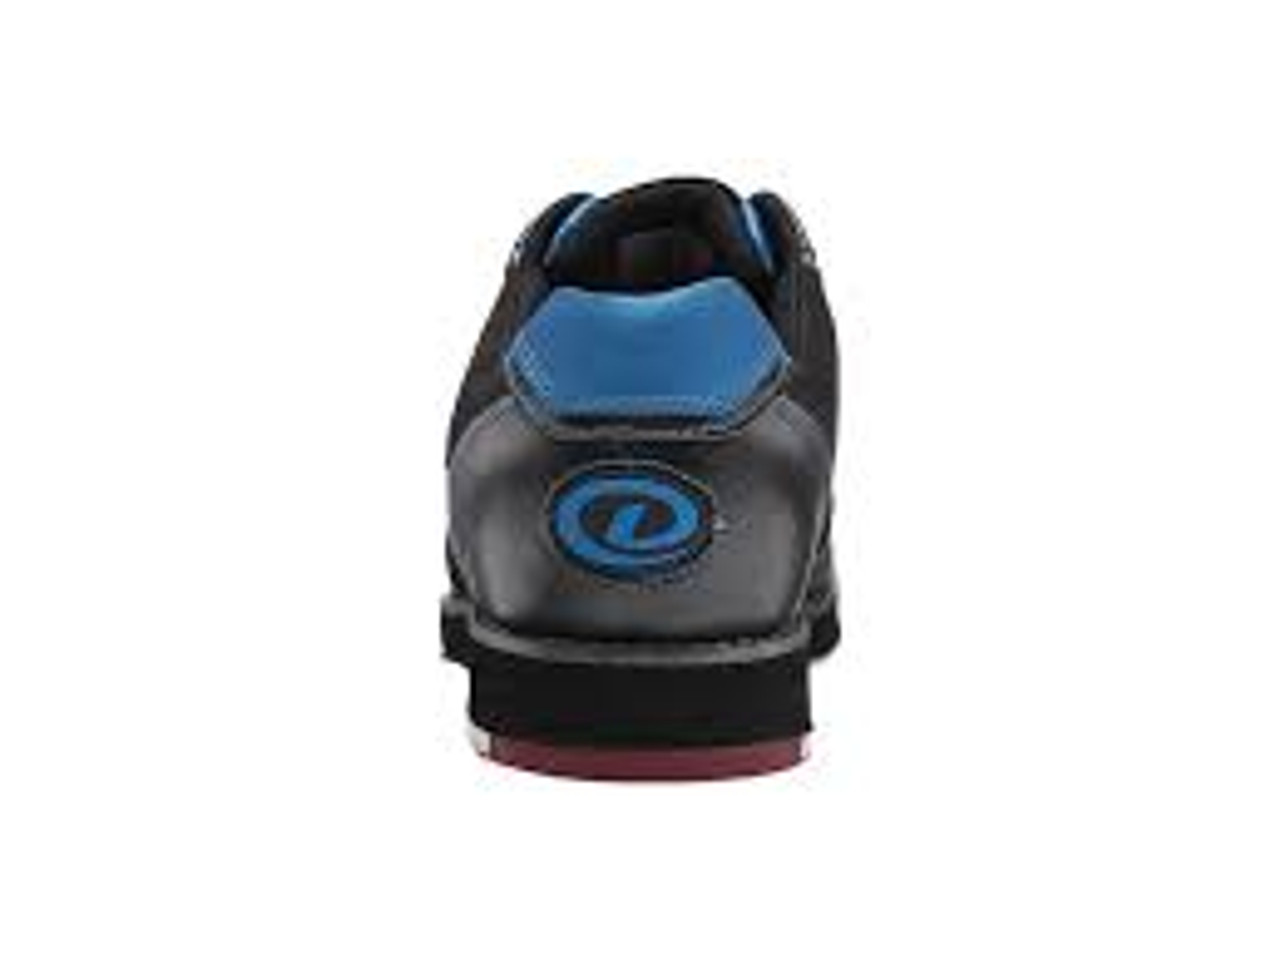 b8ace88bfe8 ... Dexter SST 8 Pro Mens Bowling Shoe Black Blue - back of shoe ...